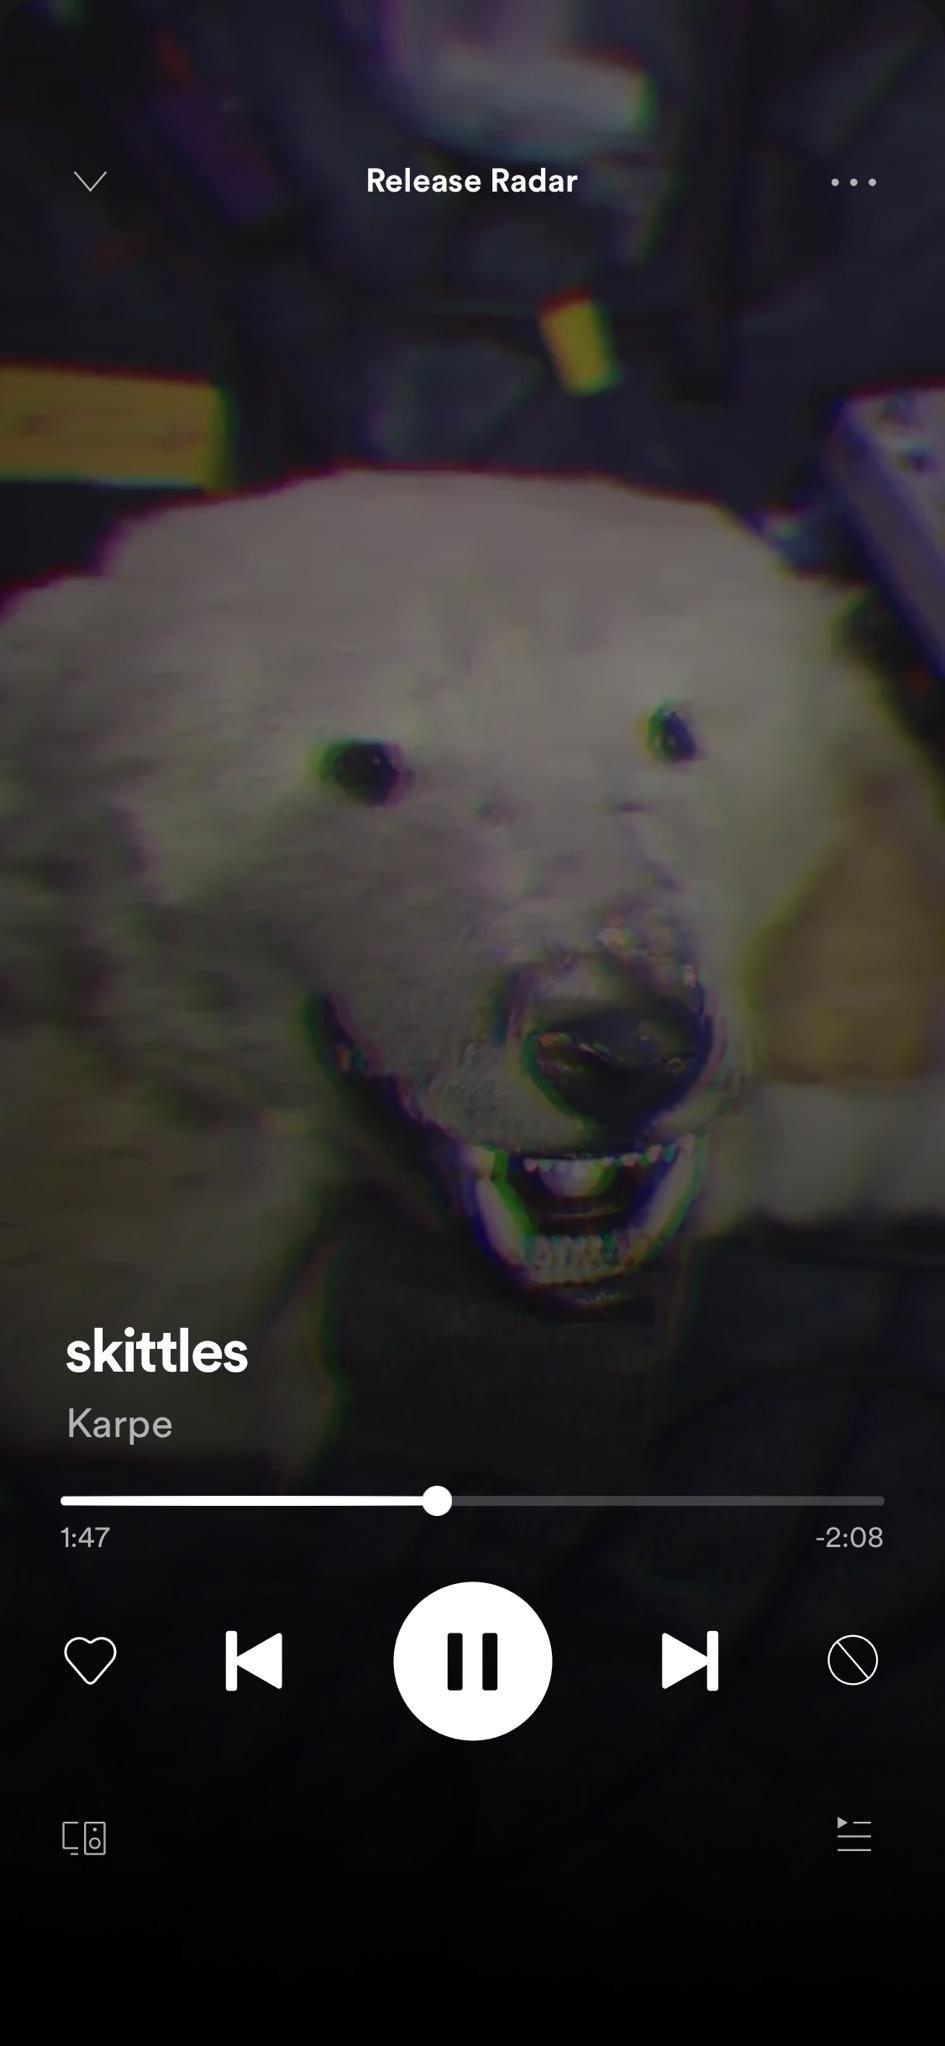 skittles karpe